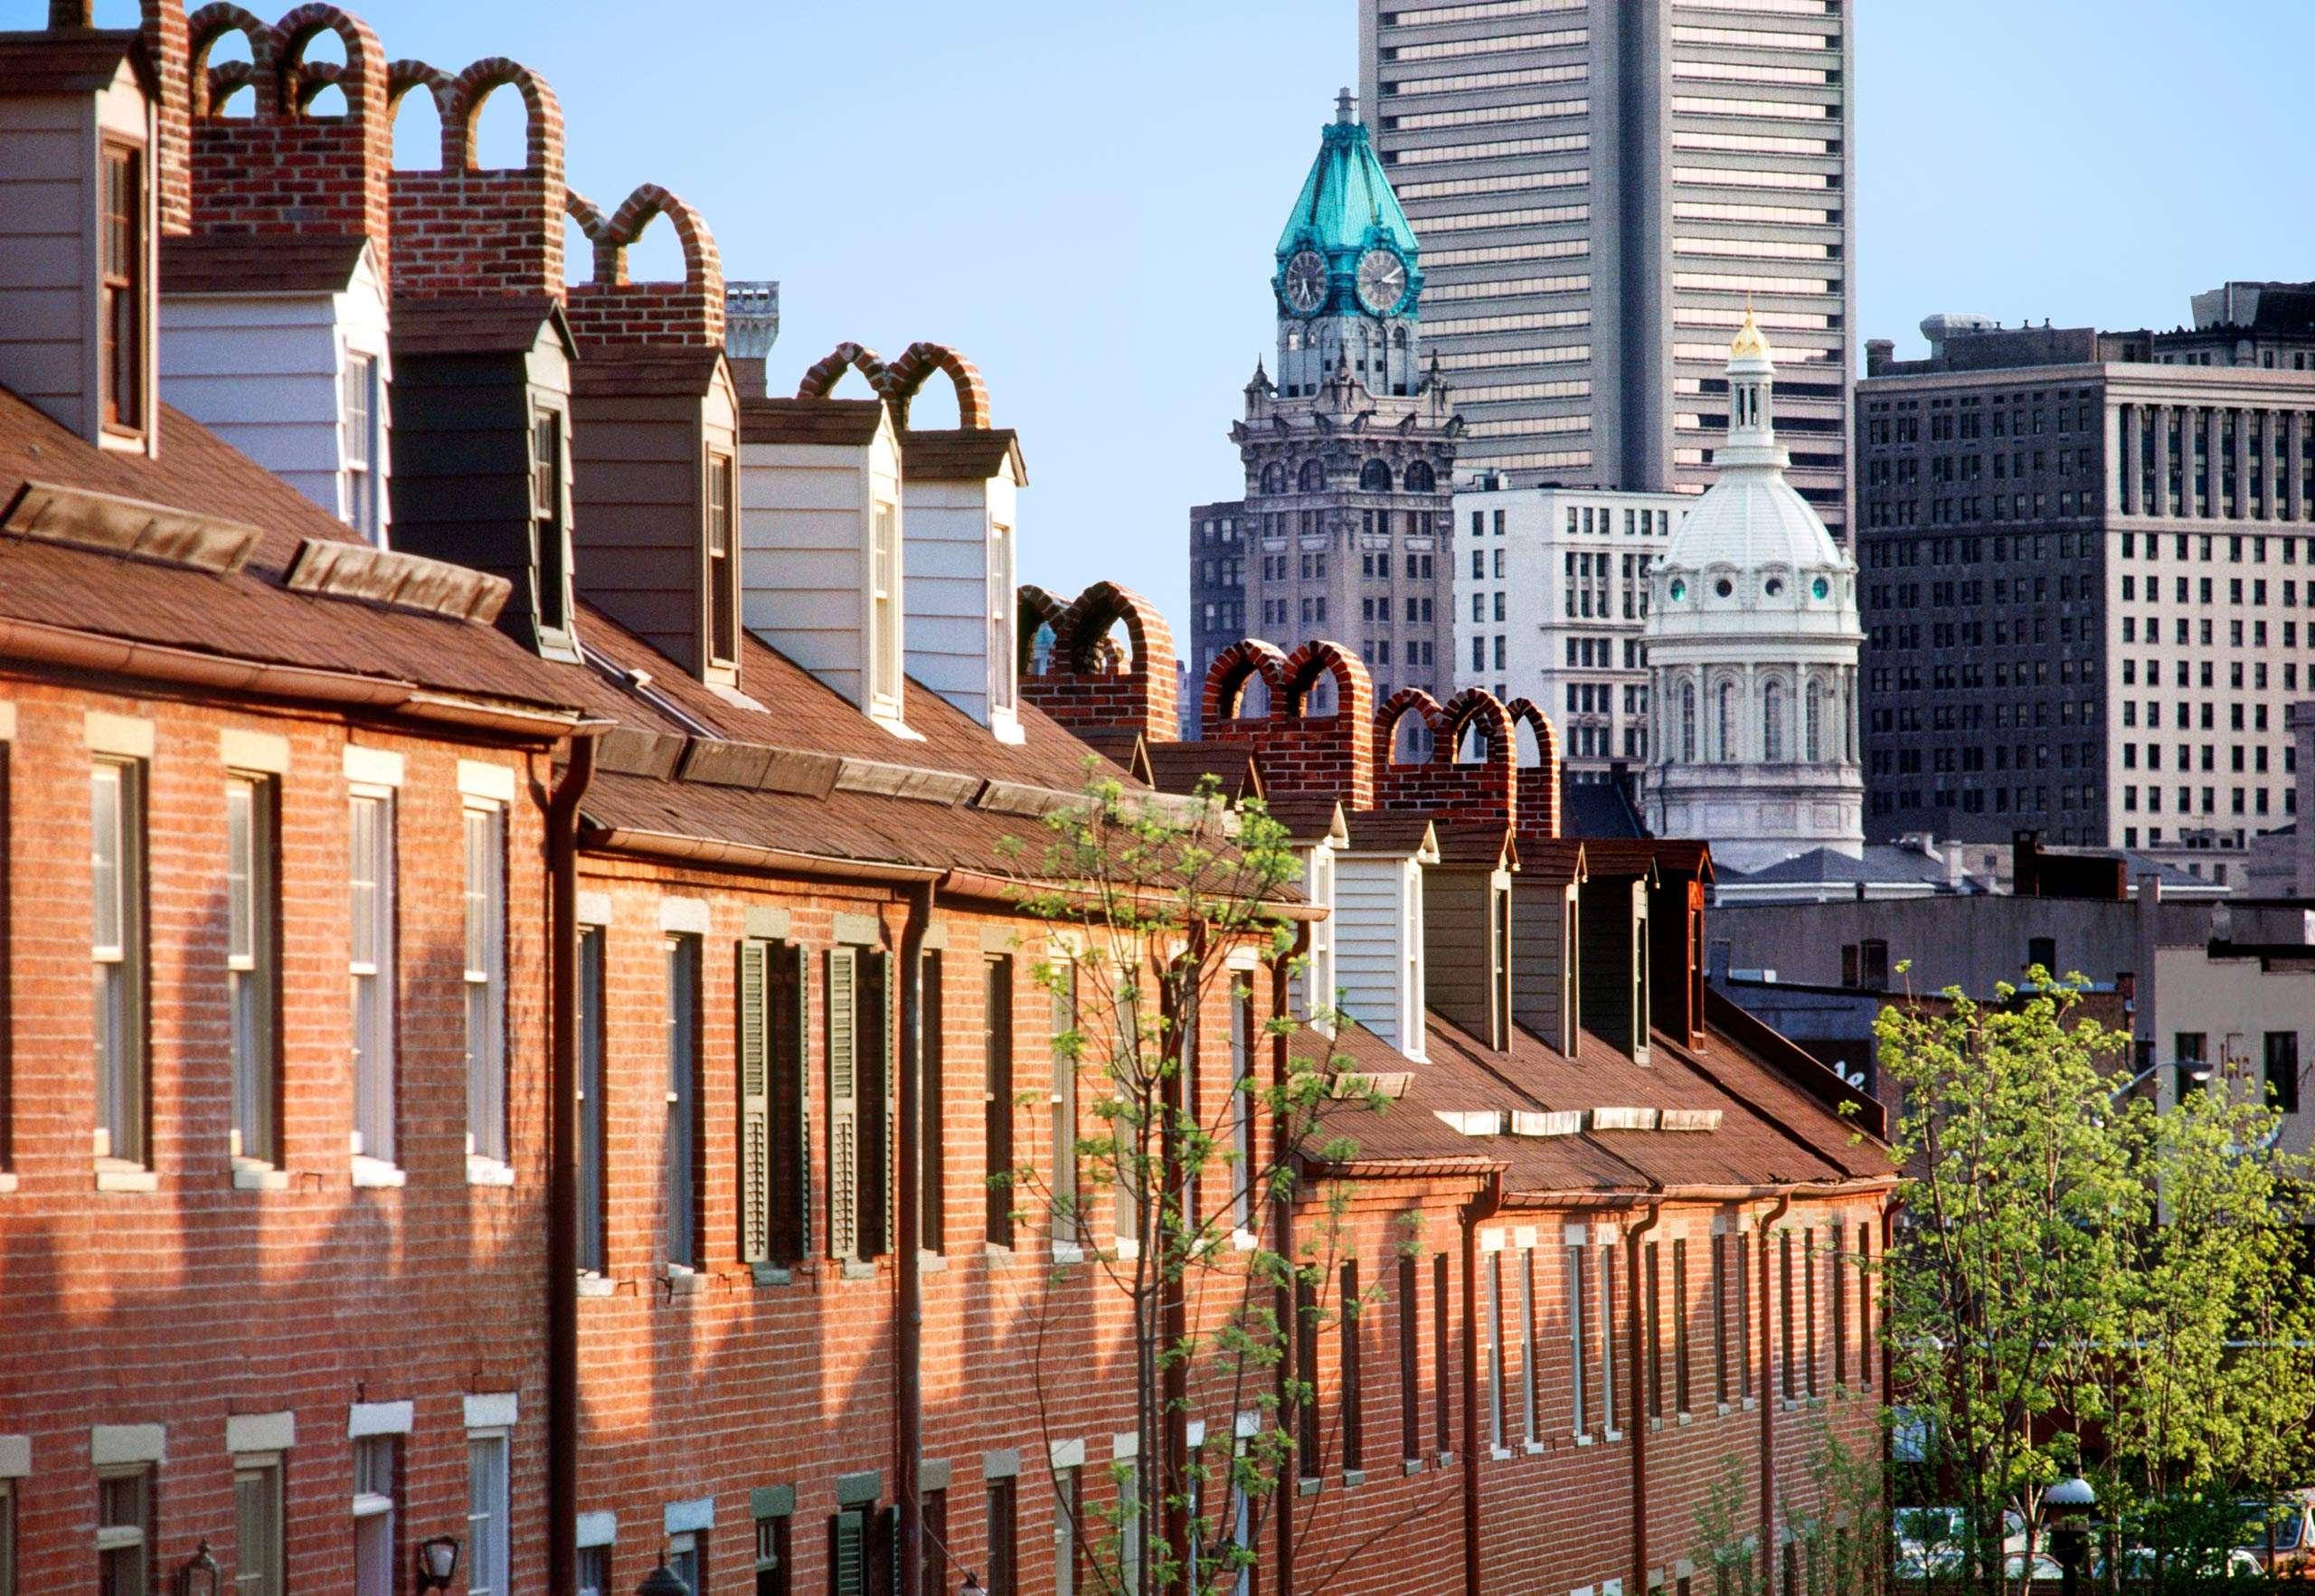 PORTFOLIO - Baltimore - Neighborhoods  #4